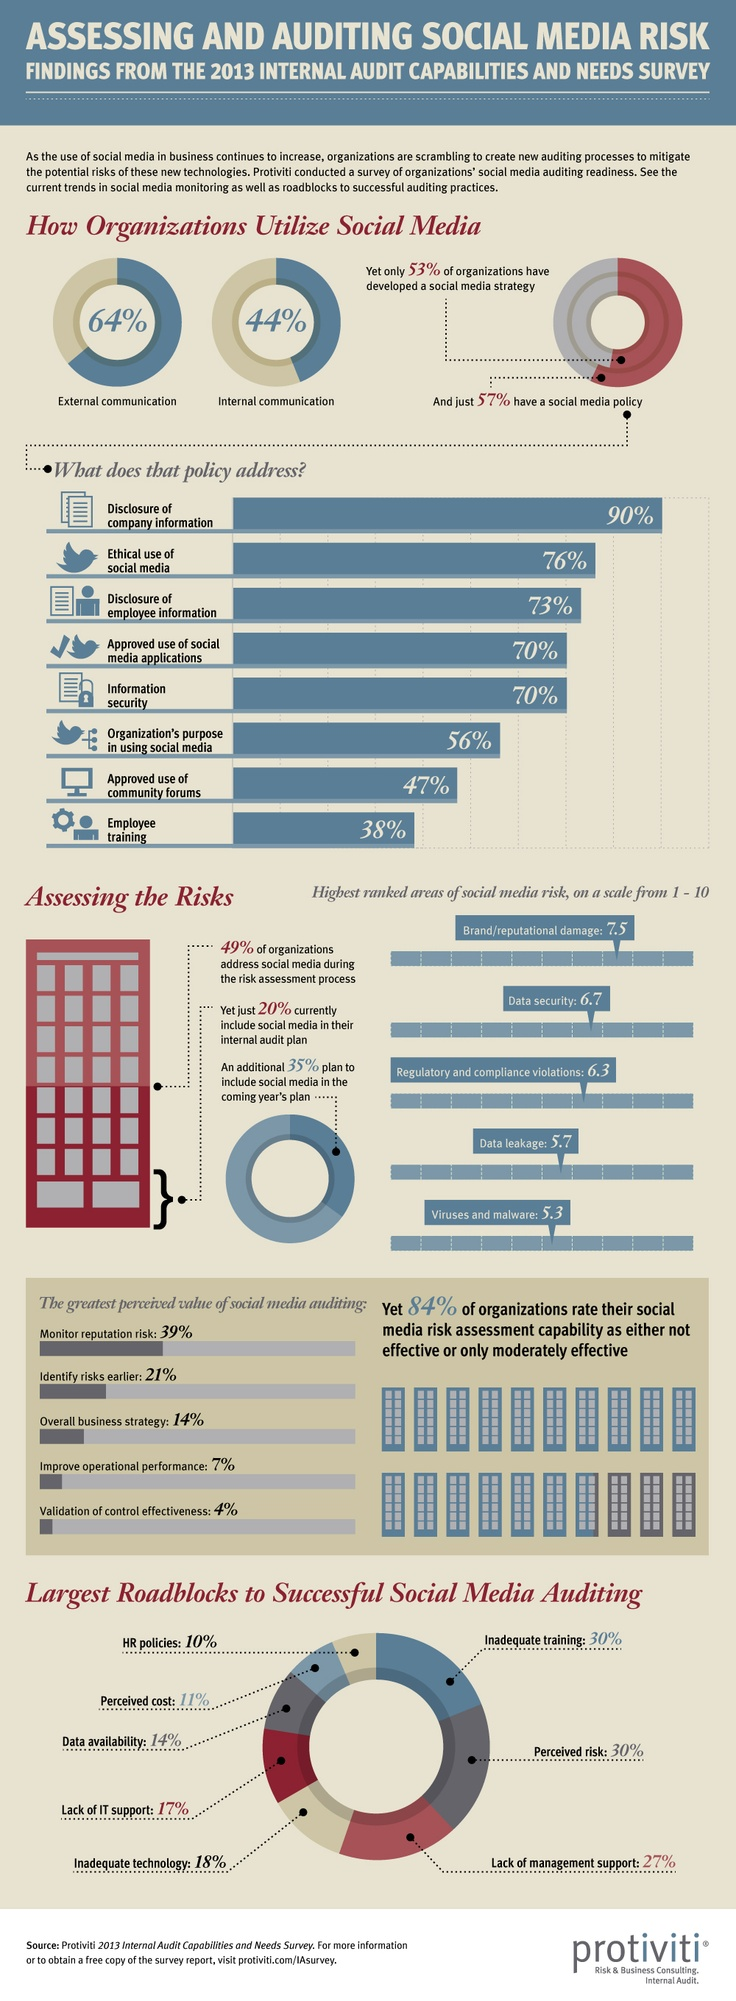 Protiviti's 2013 Internal Audit Capabilities and Needs Survey